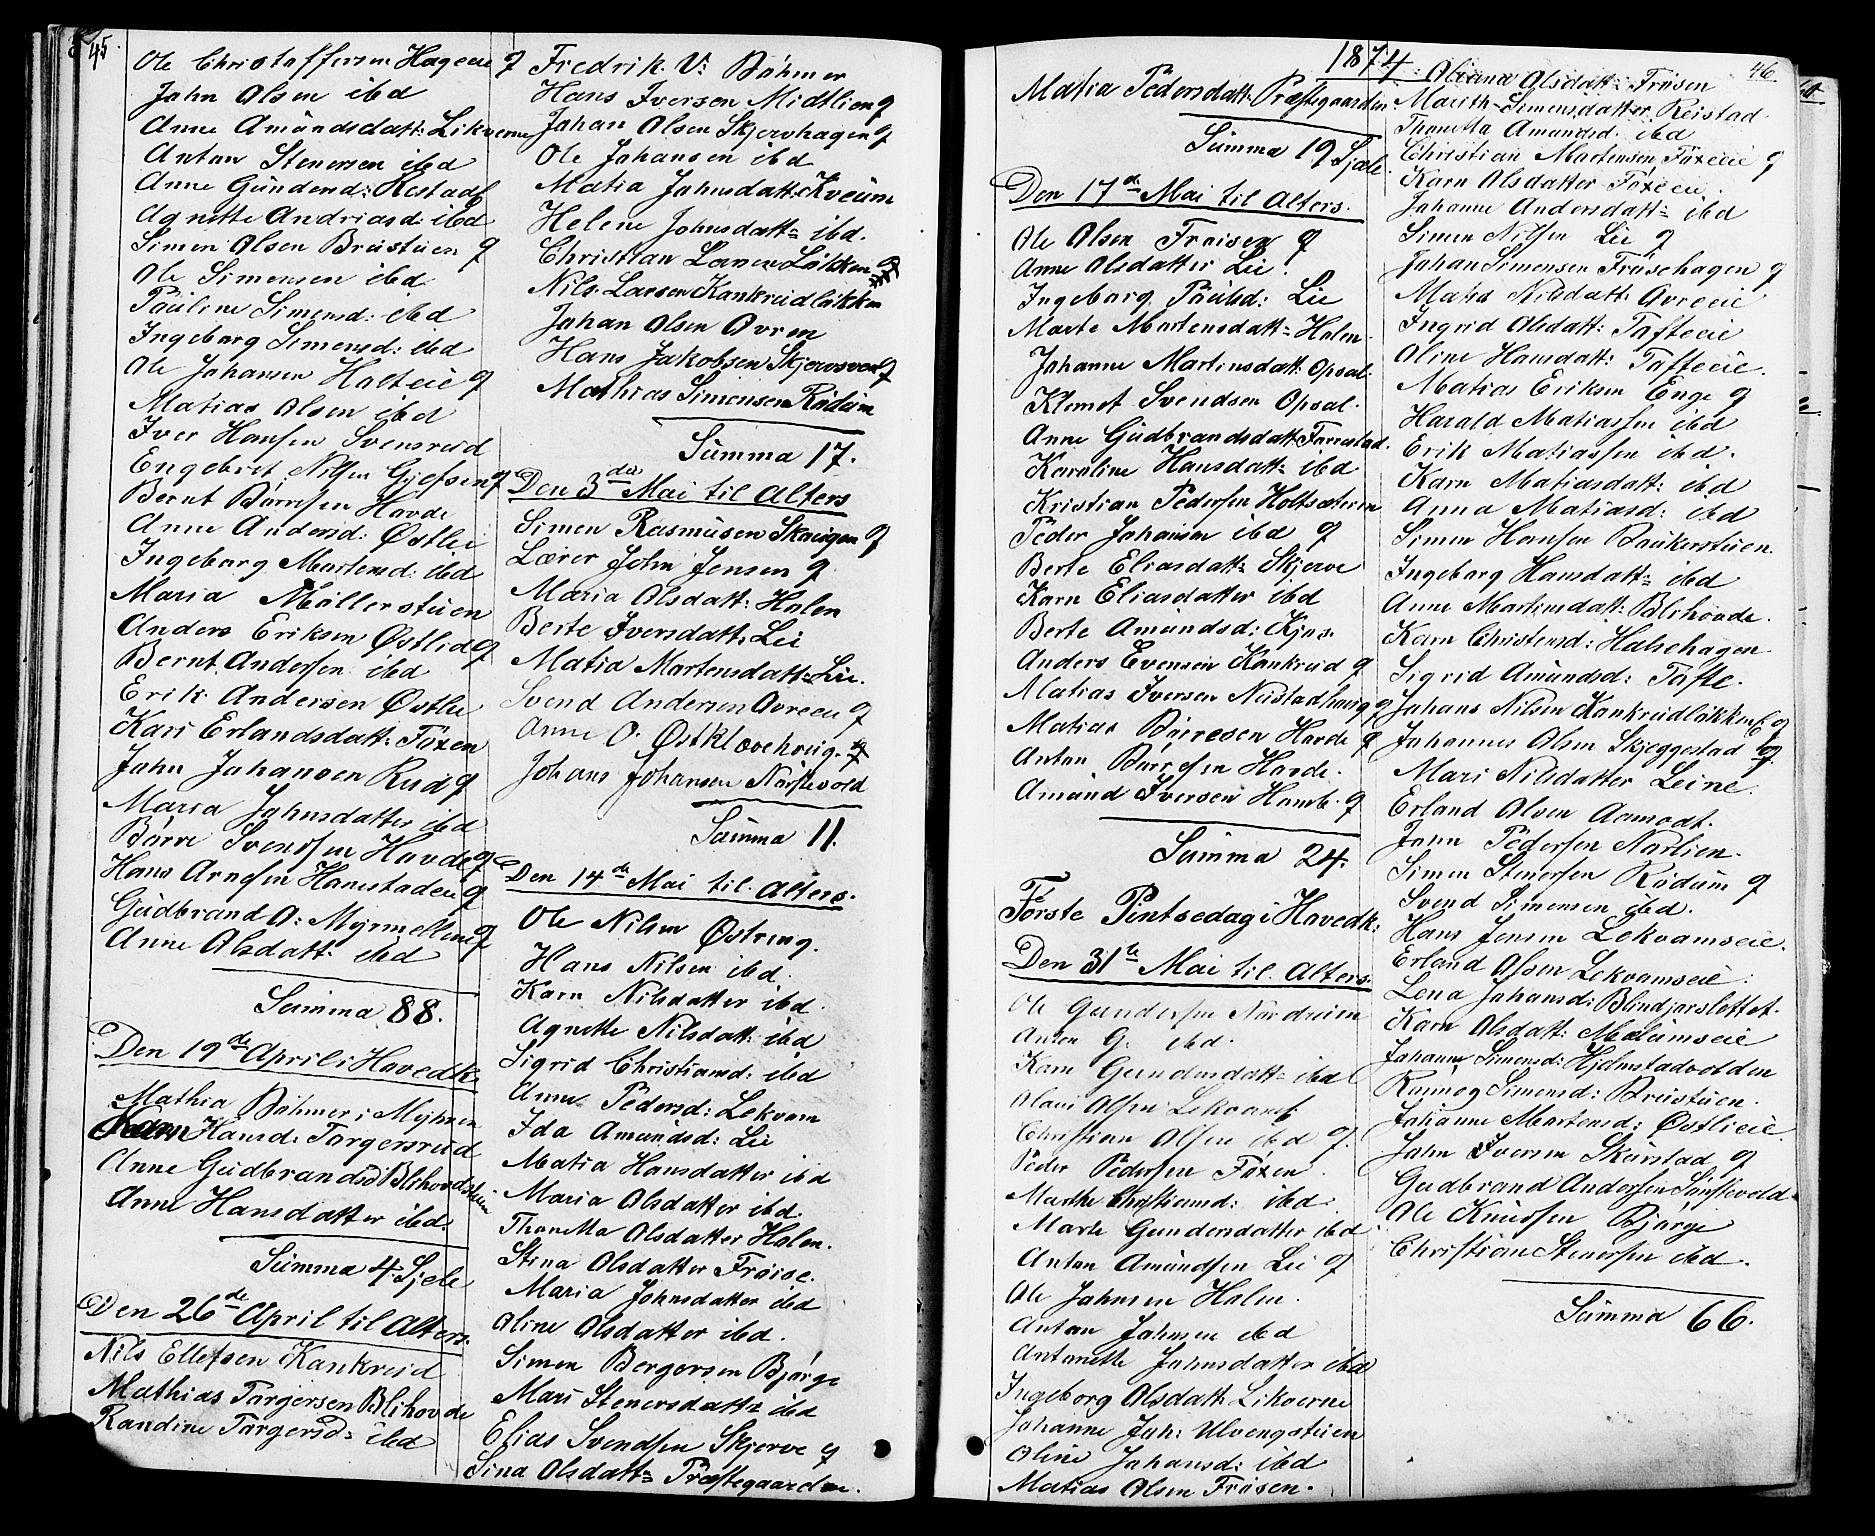 SAH, Østre Gausdal prestekontor, Klokkerbok nr. 1, 1863-1893, s. 45-46